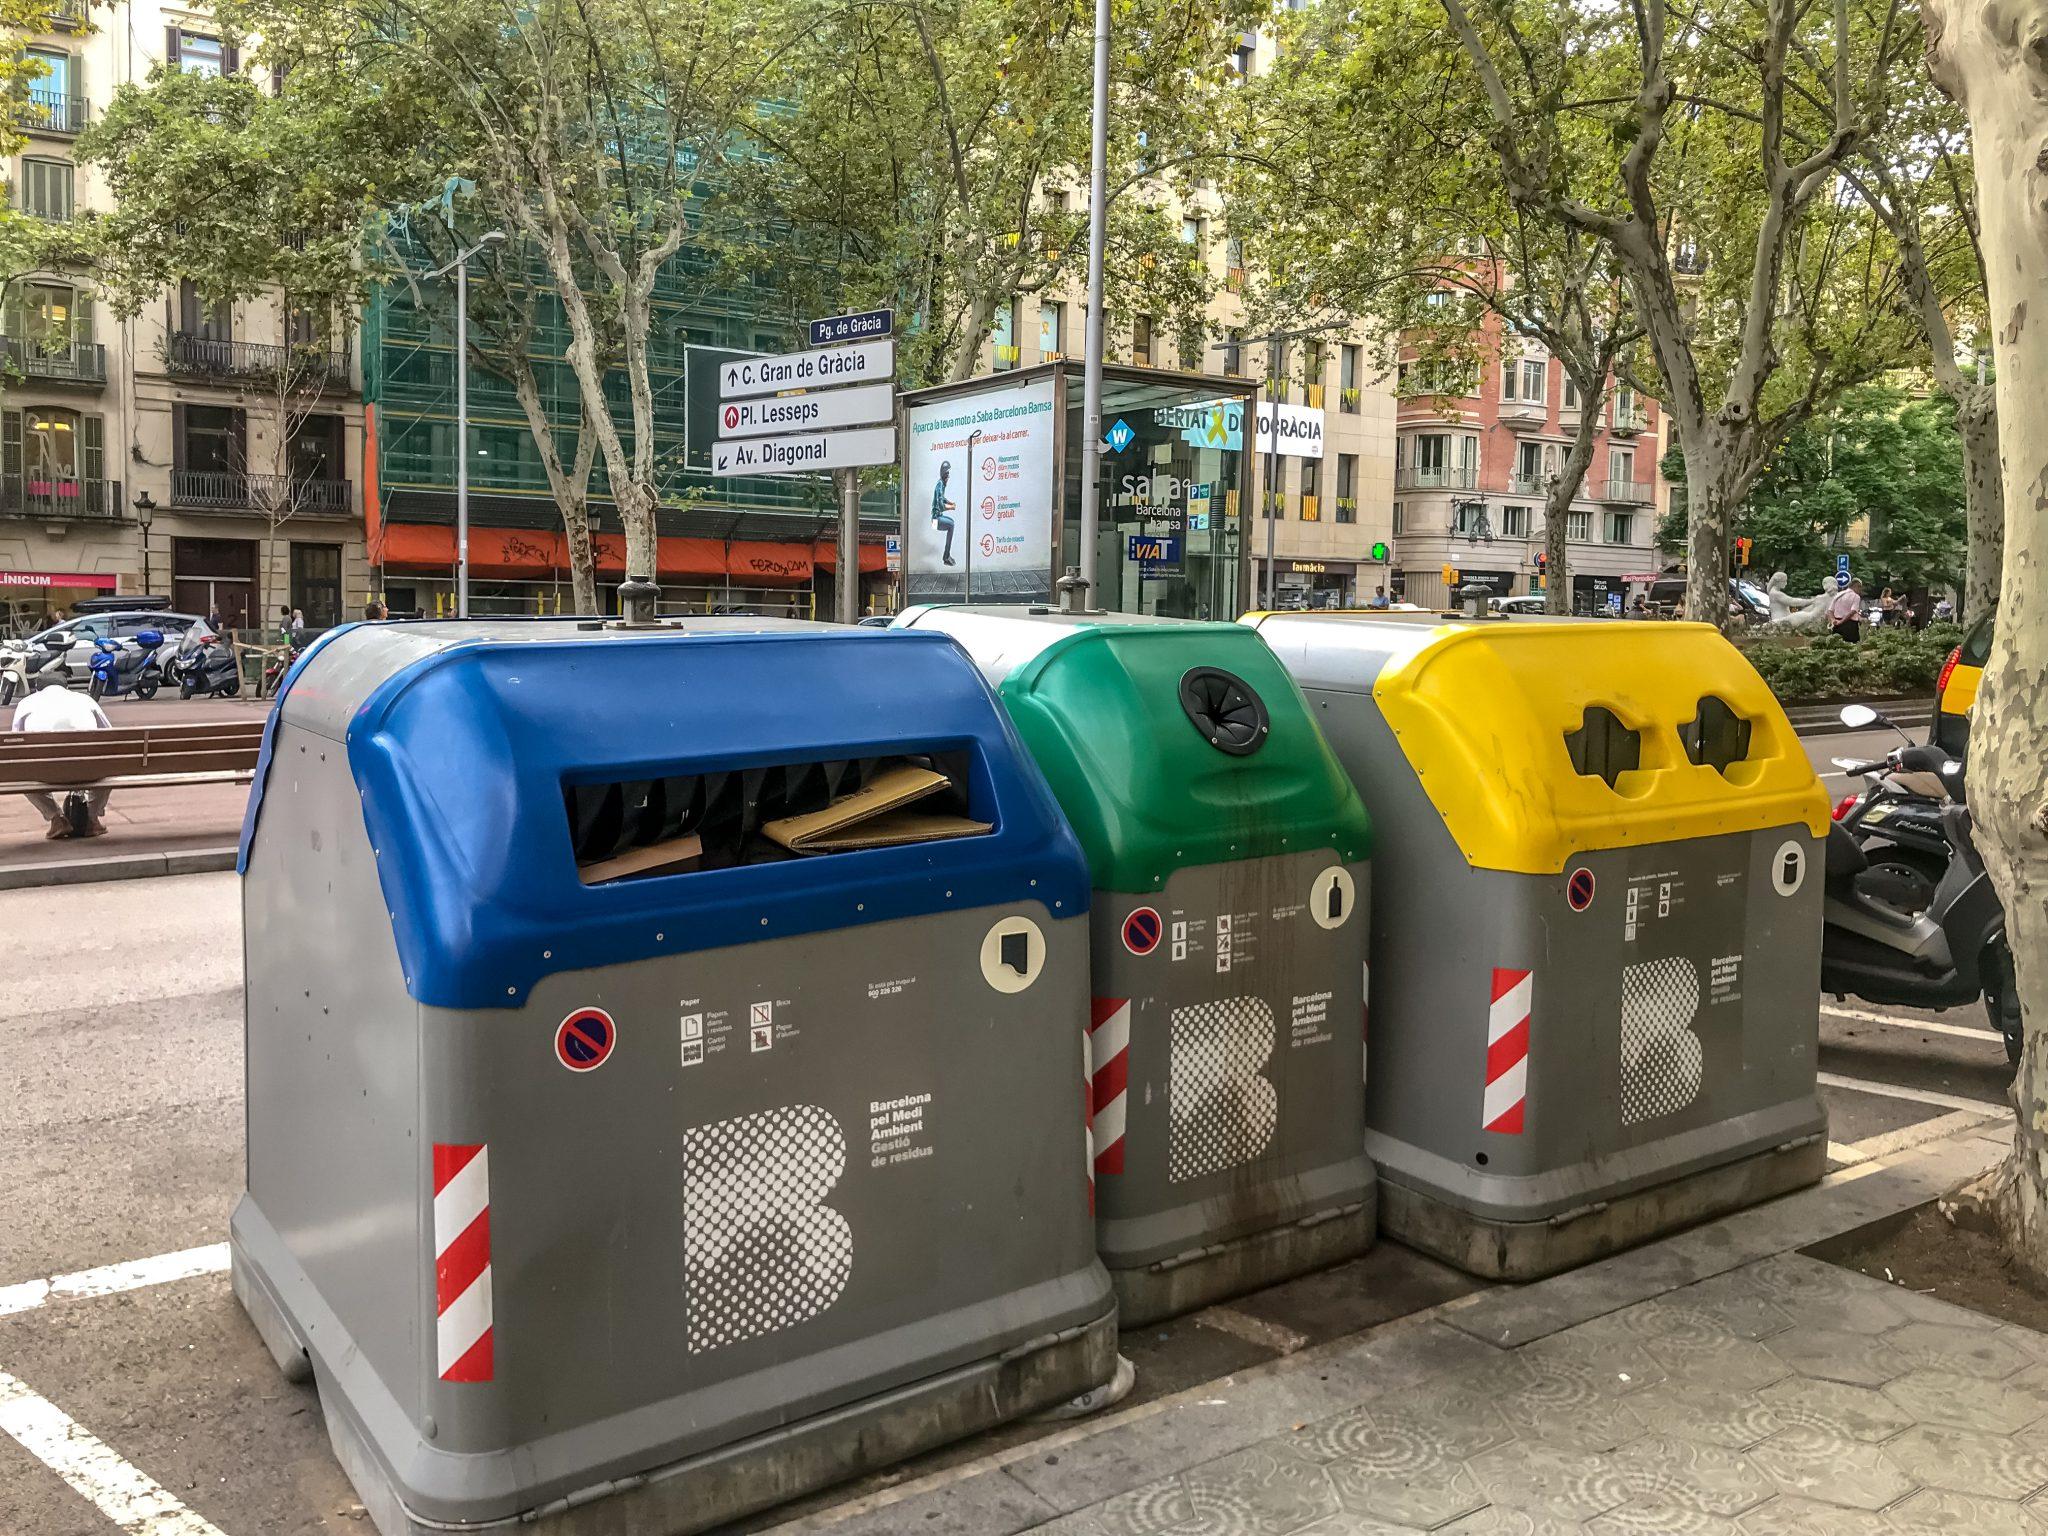 So sehen die Müllcontainer in Barcelona aus...